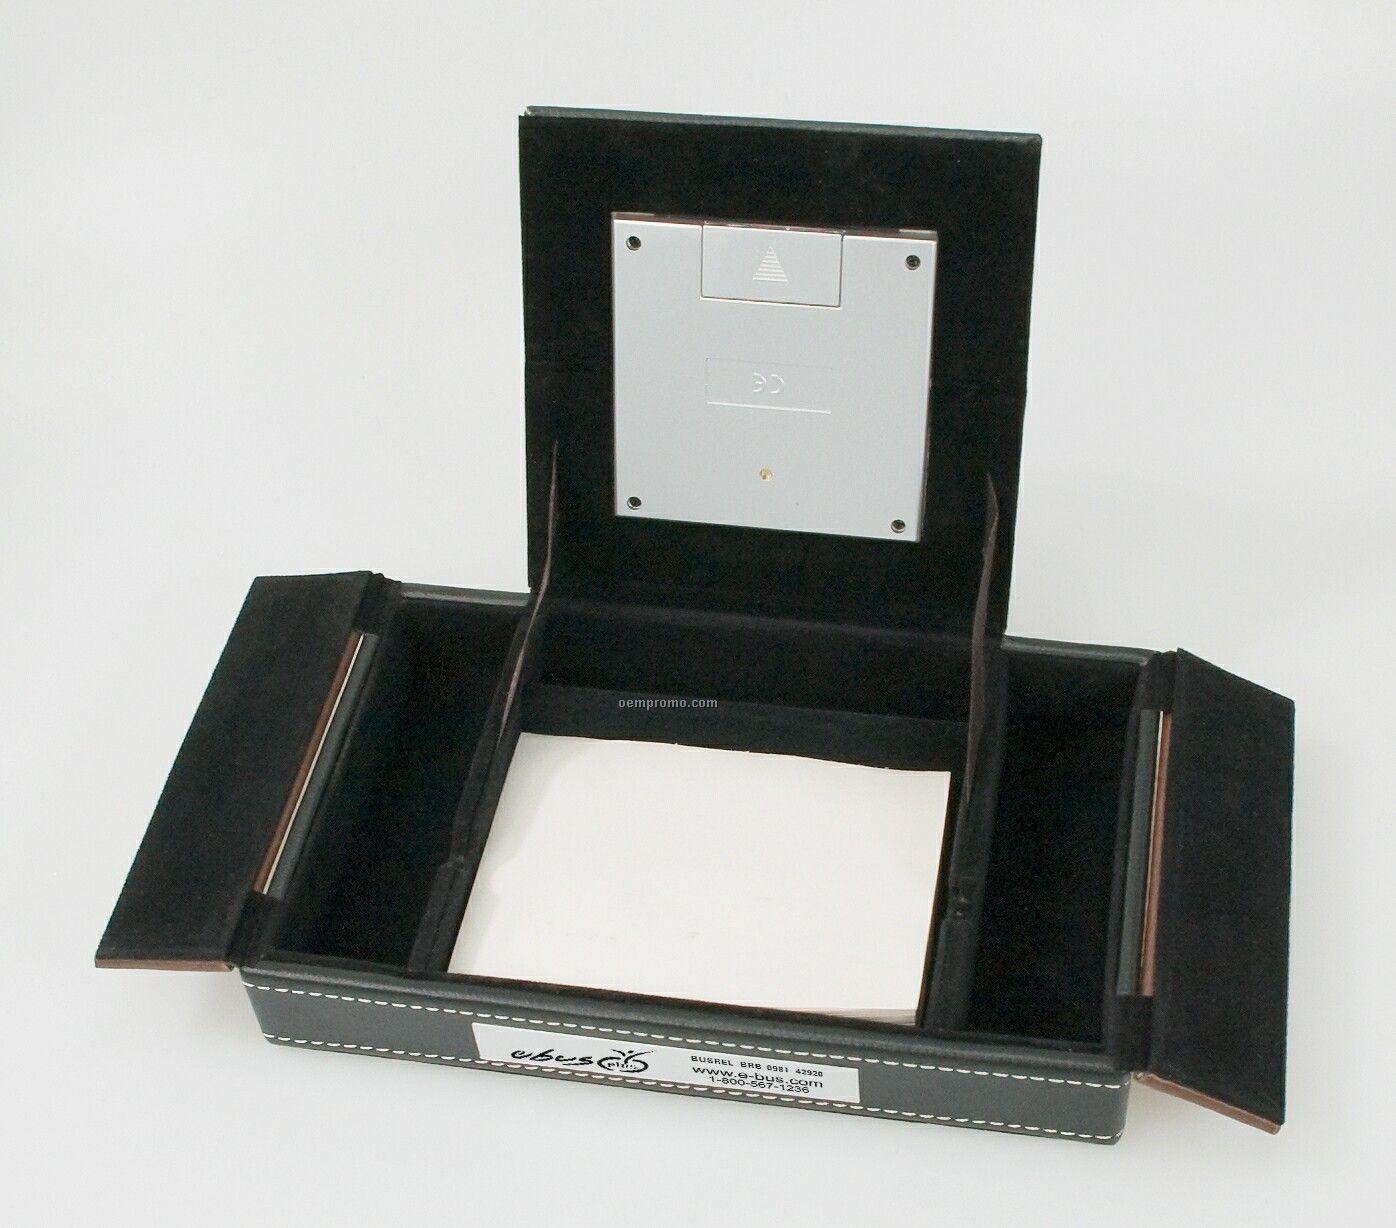 Presidential Series Folding Digital Desk Clock